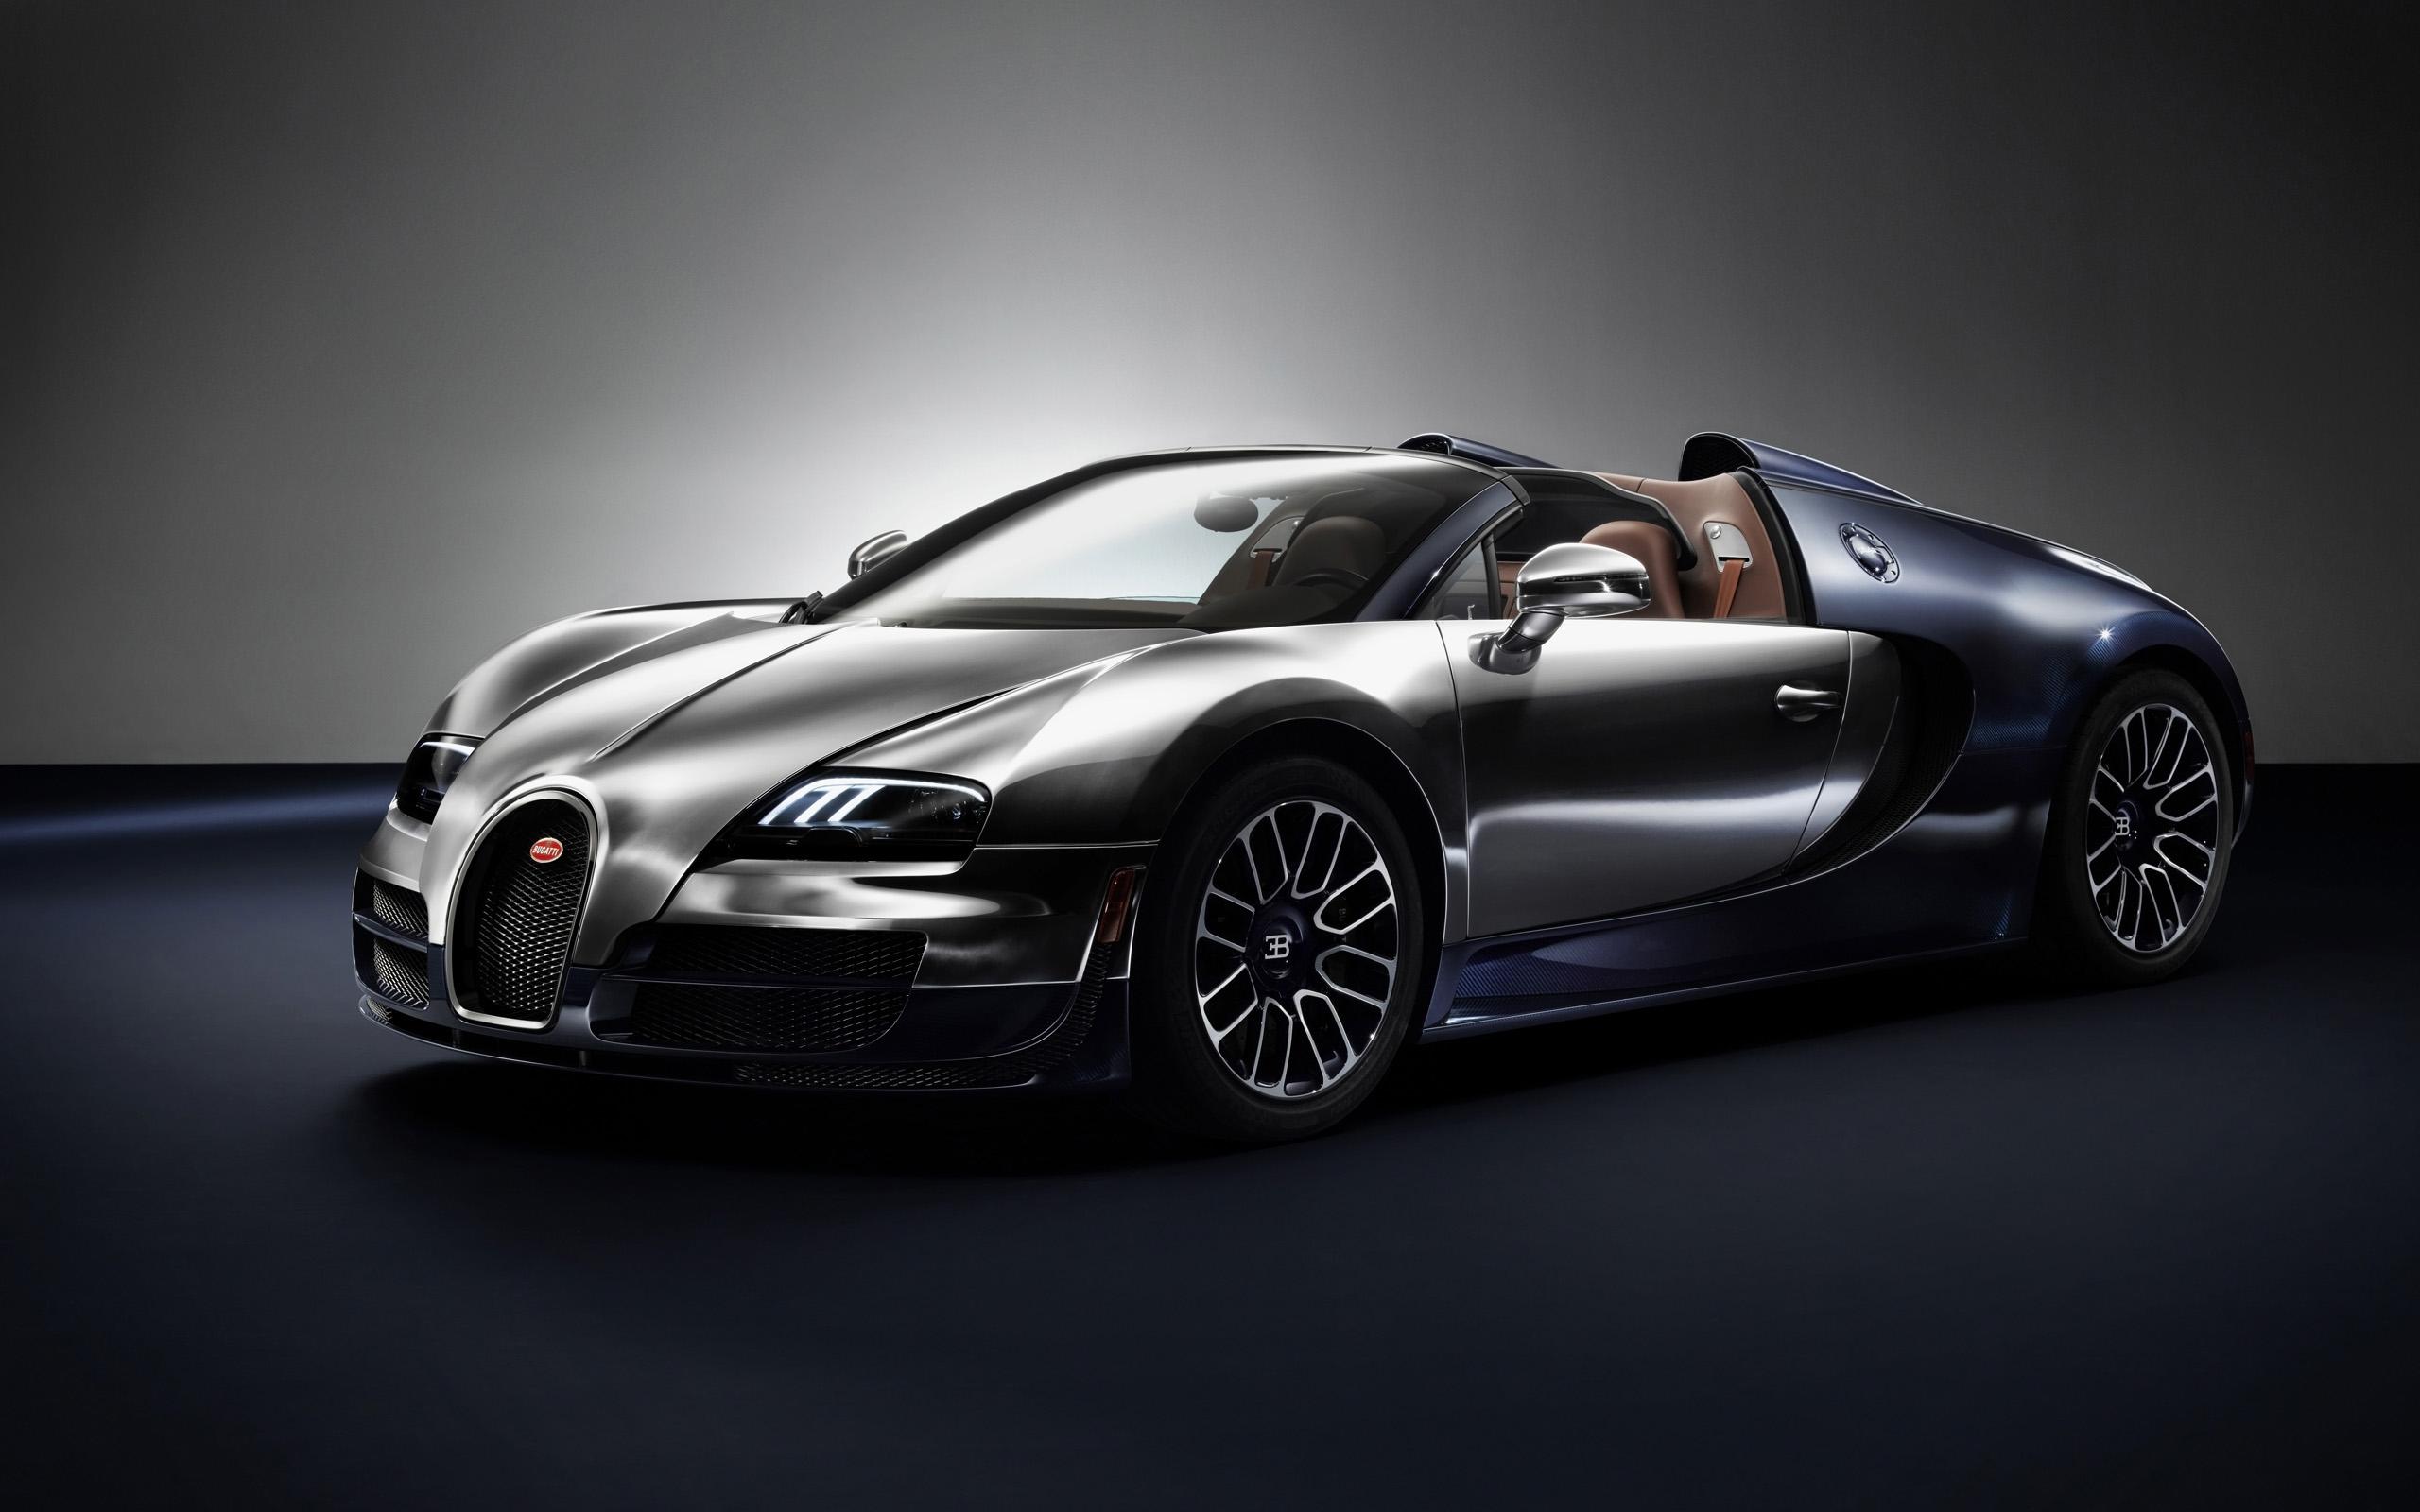 2014 bugatti veyron grand sport vitesse legend ettore bugatti wallpaper hd car wallpapers id. Black Bedroom Furniture Sets. Home Design Ideas